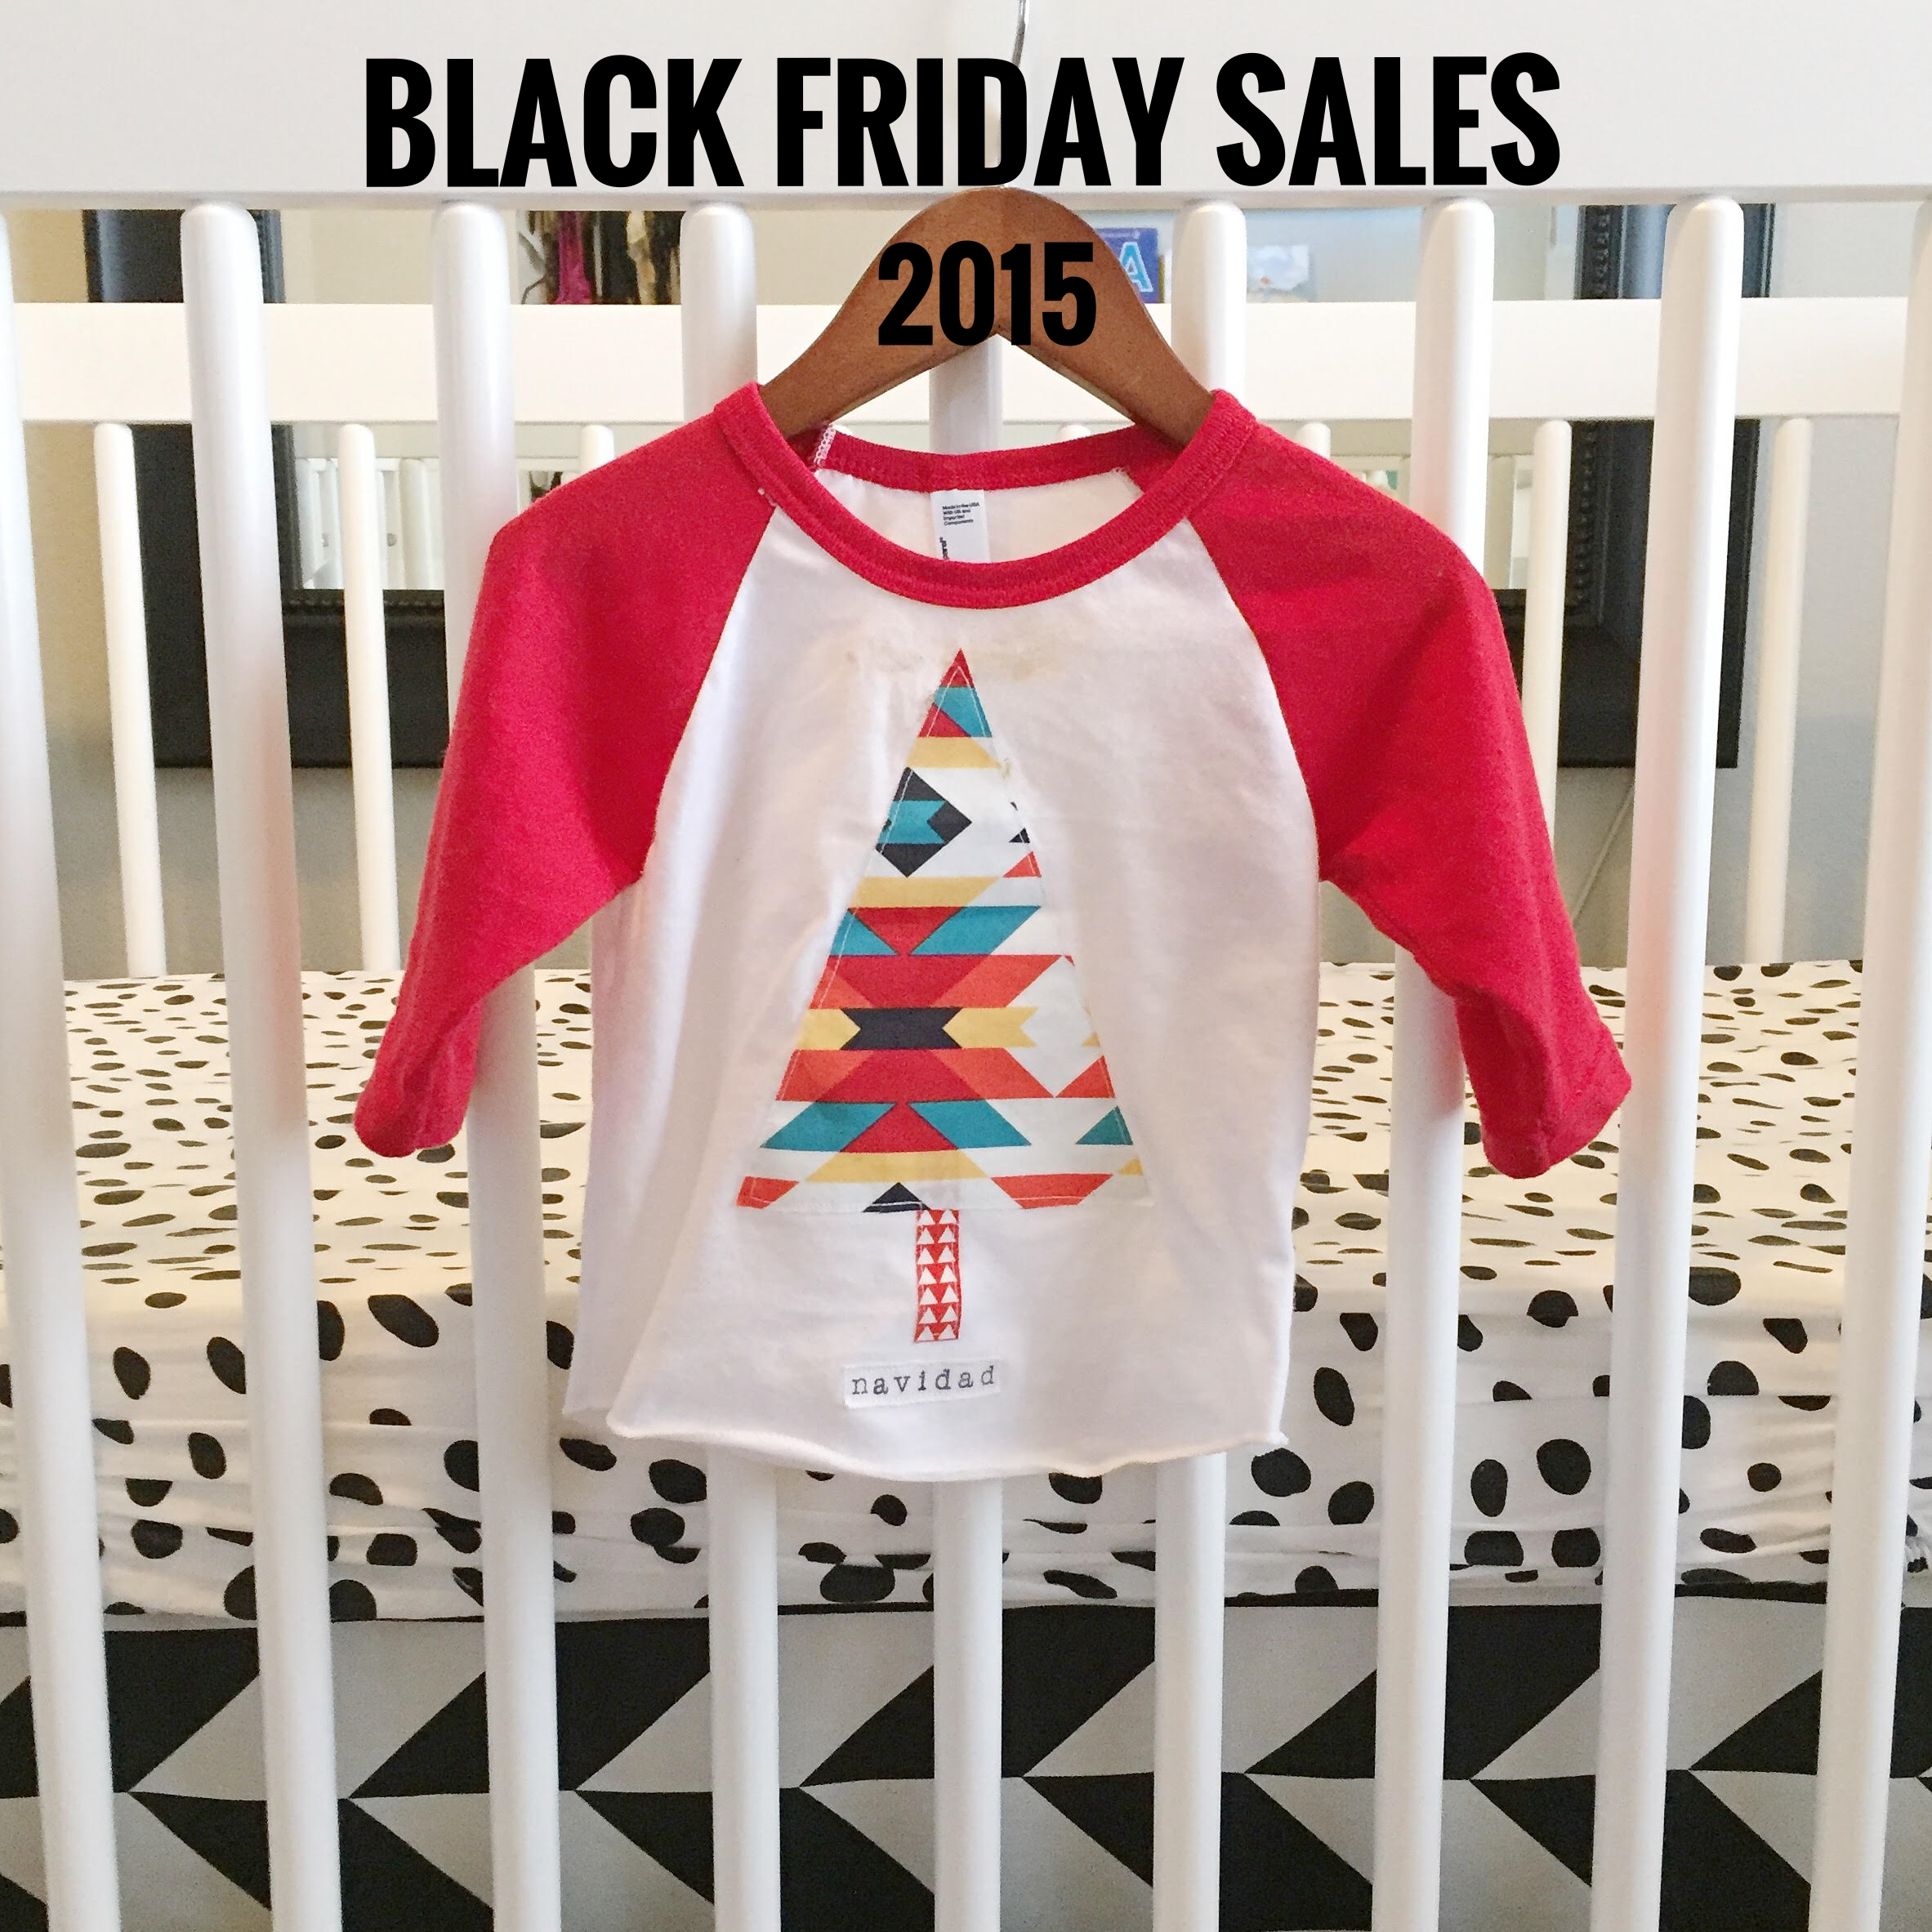 The Best Black Friday Sales   Momma Society-The Community of Modern Moms   www.MommaSociety.com